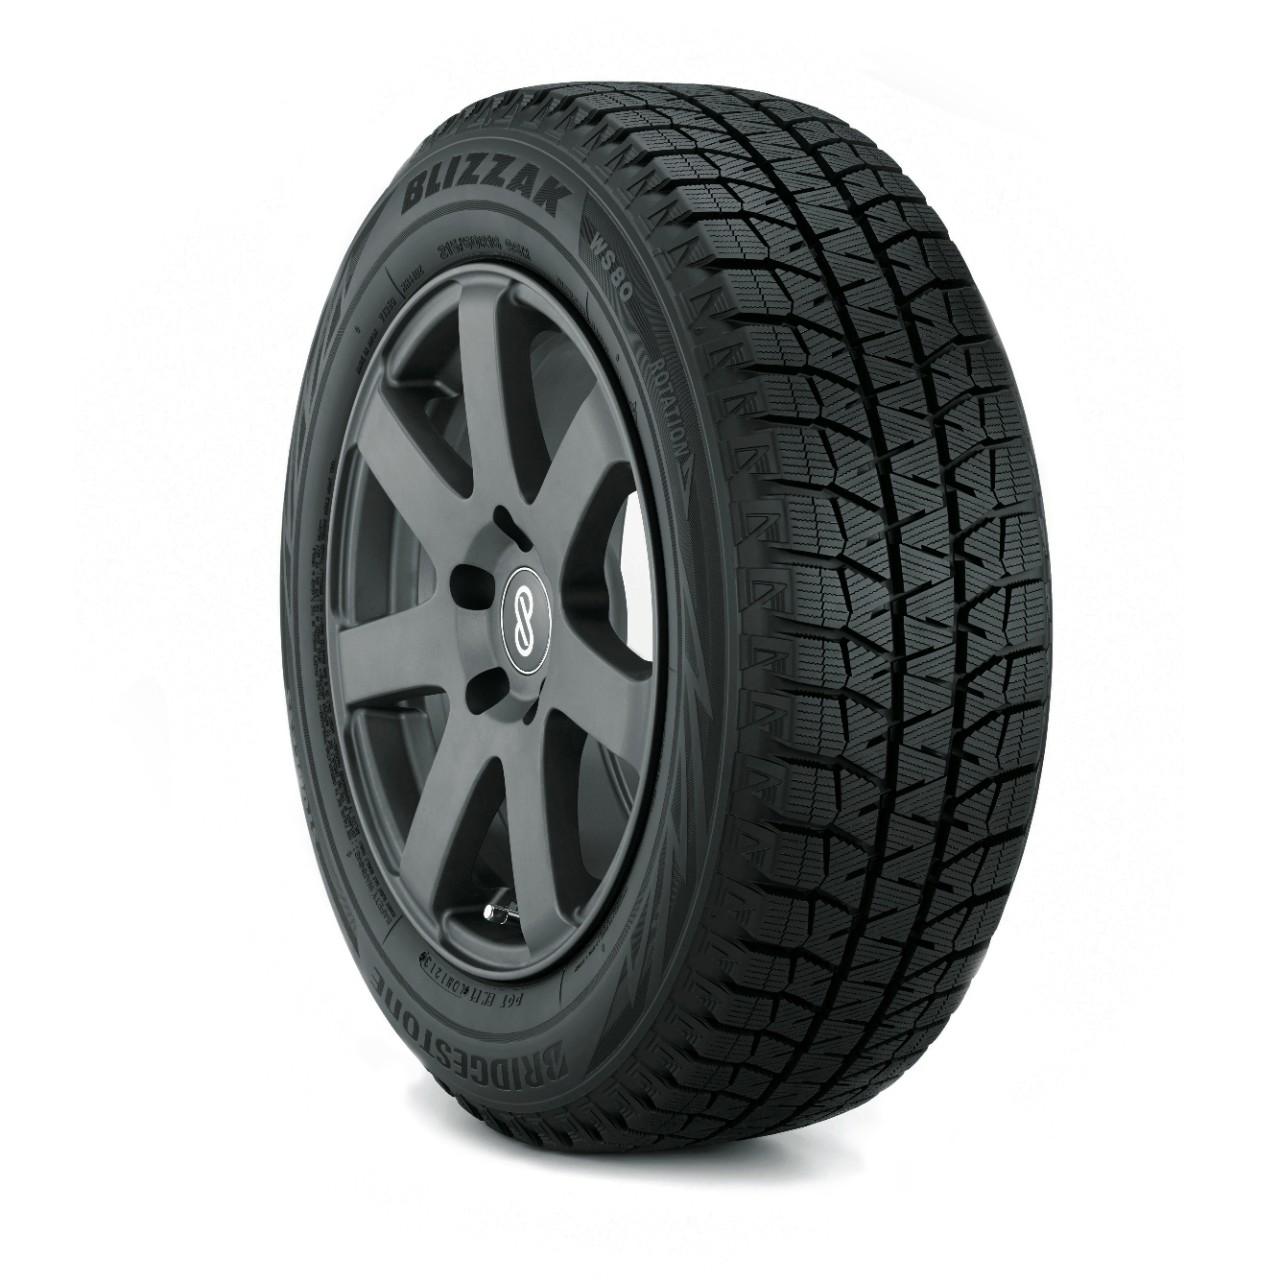 Best winter tires - Bridgestone